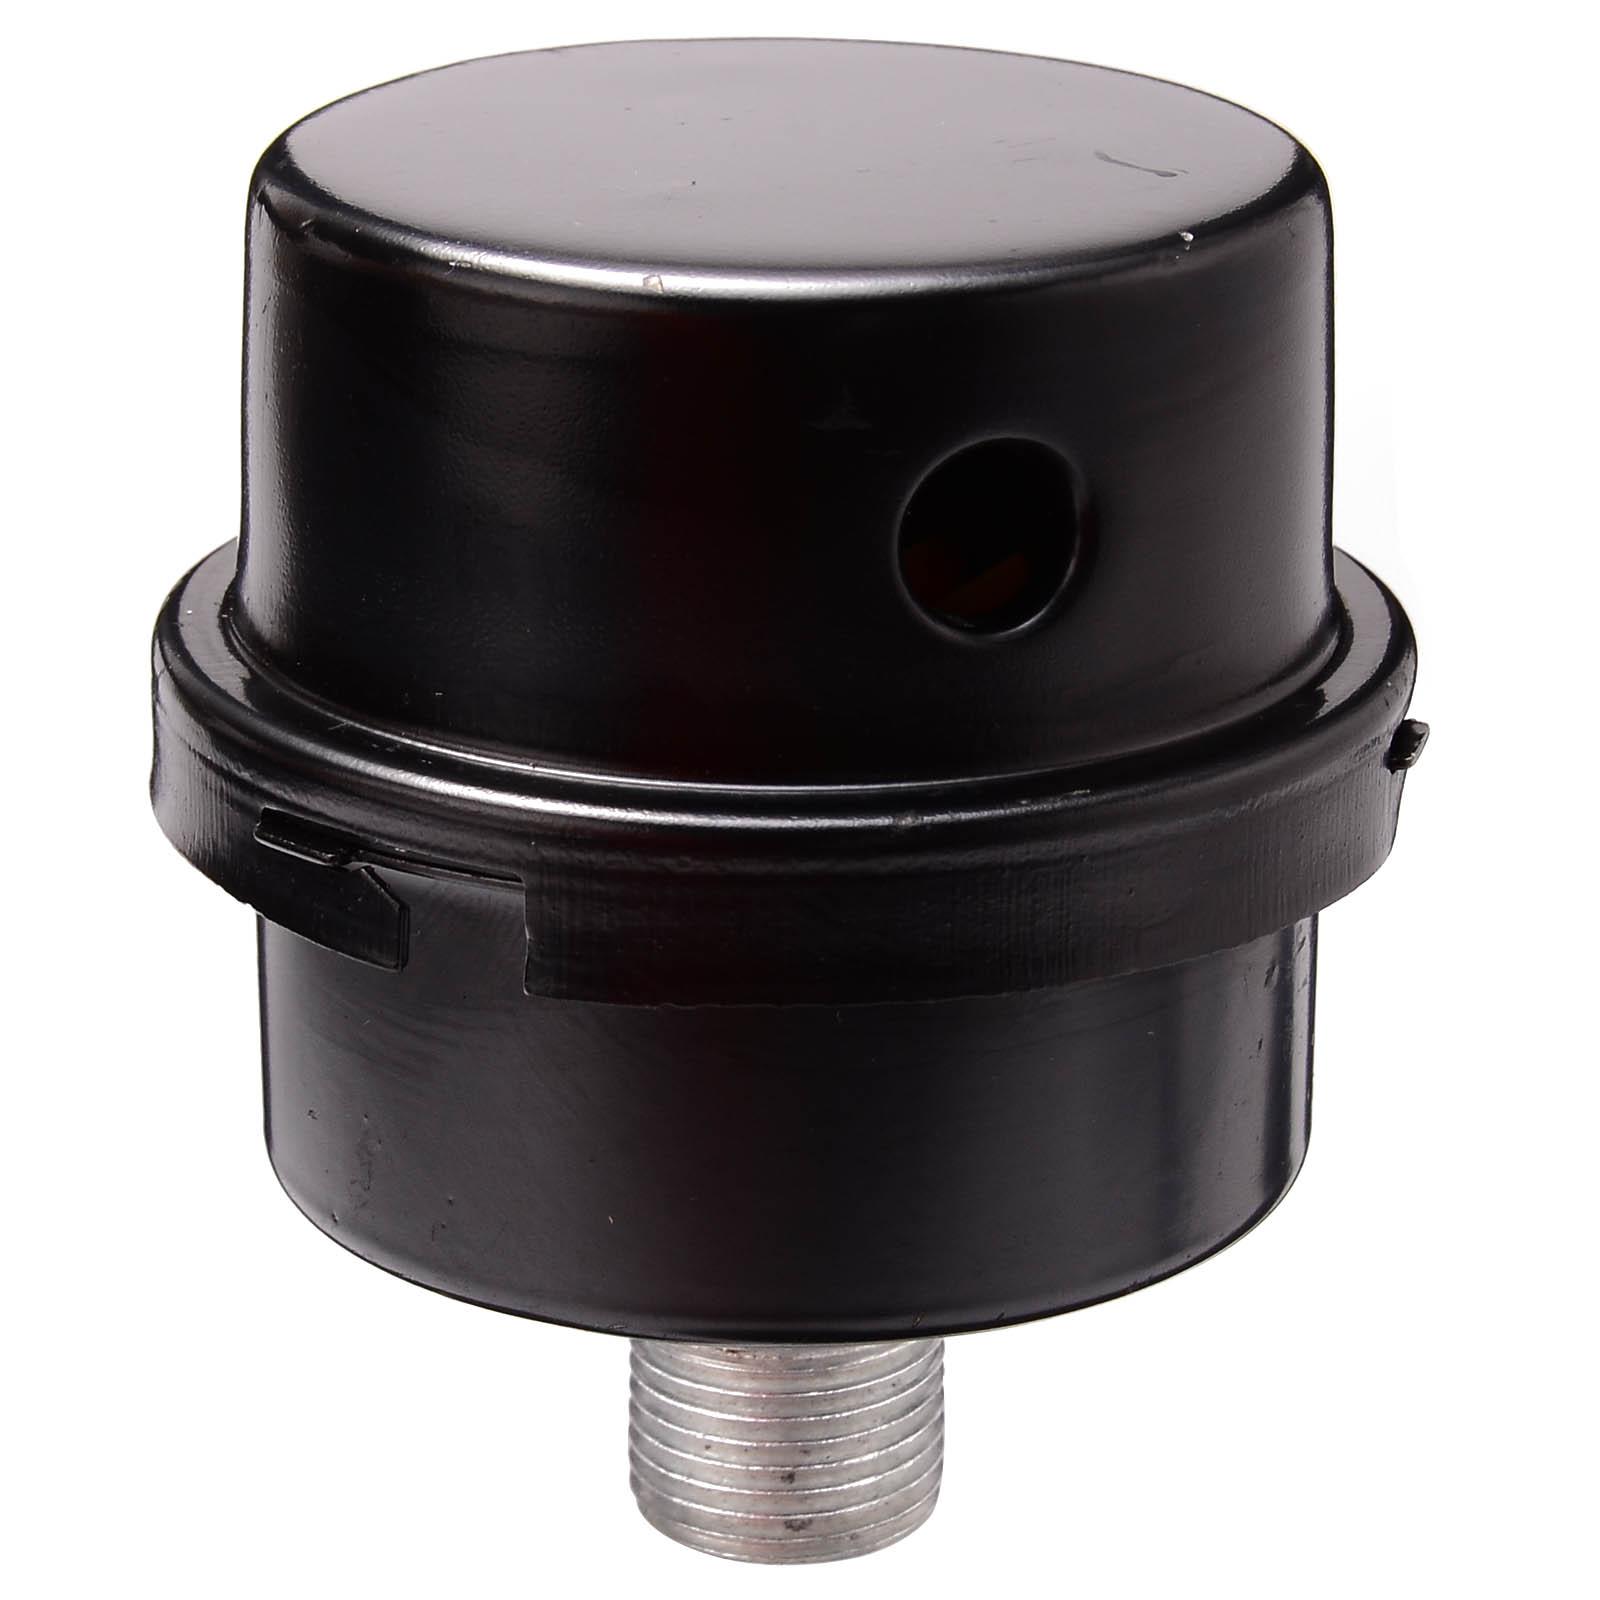 uxcell 1 Thread Black Plastic Shell Air Compressor Silencer Filter